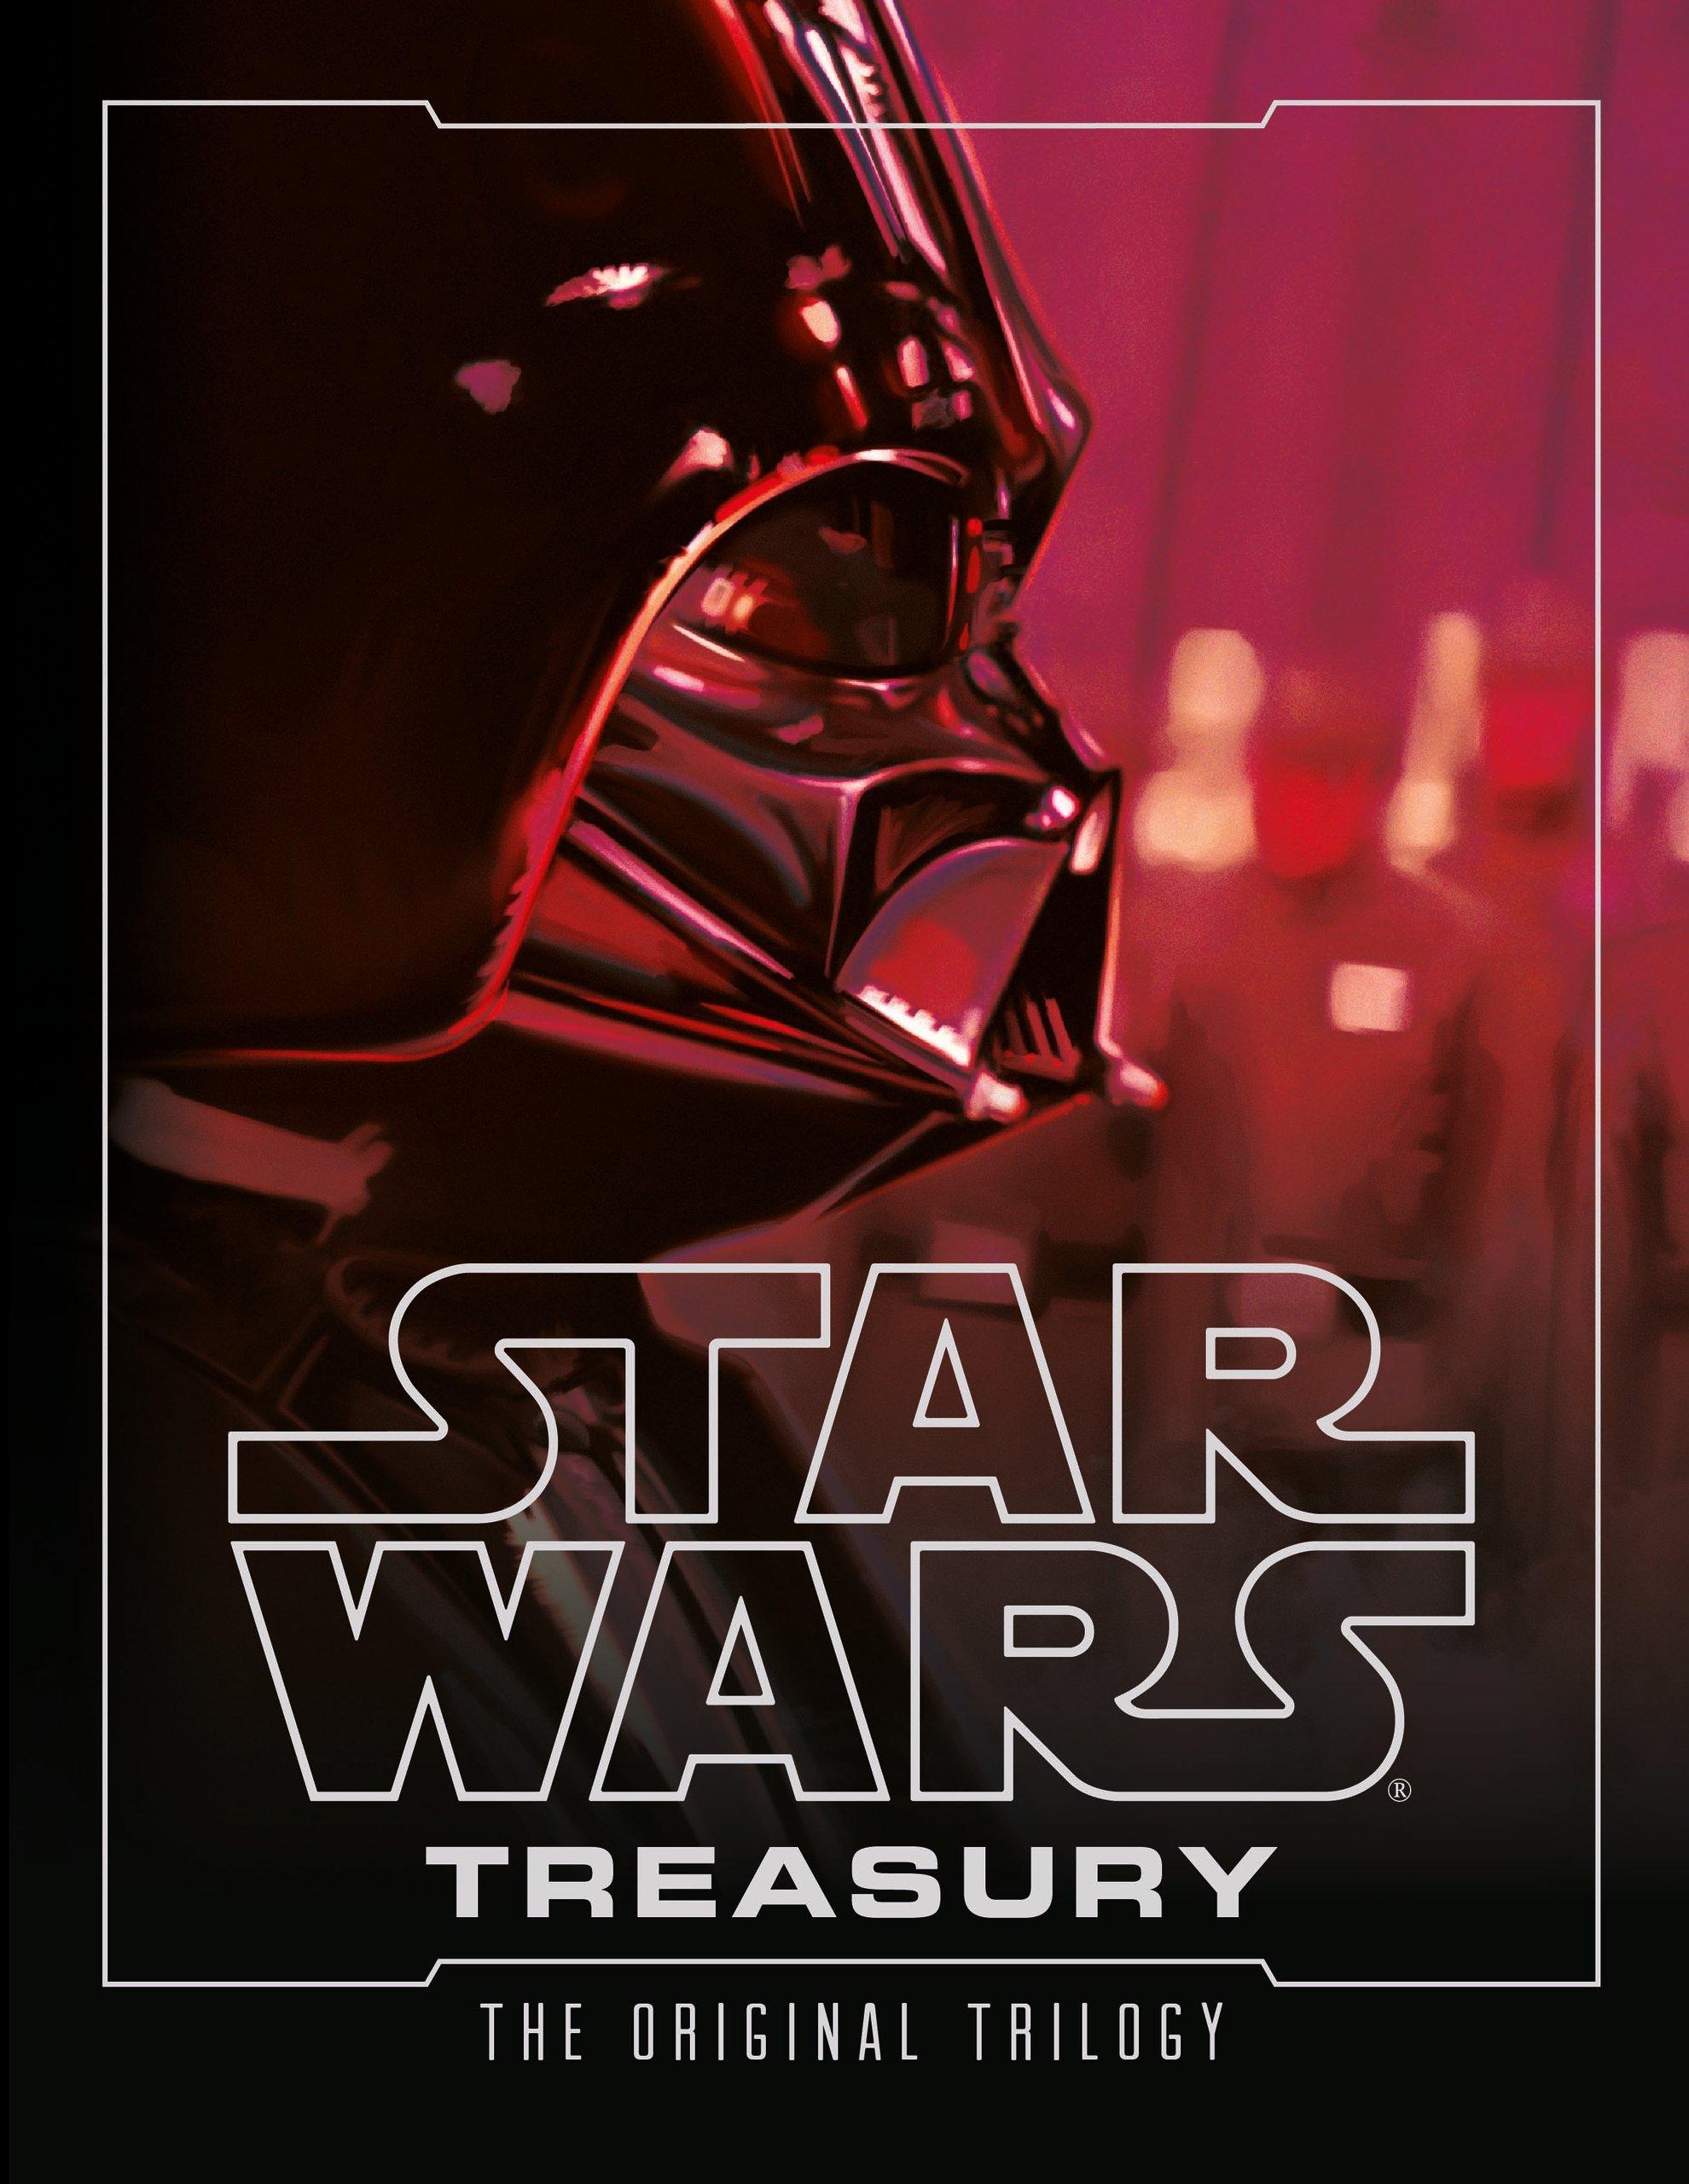 Star Wars Treasury The Original Trilogy Wookieepedia Fandom